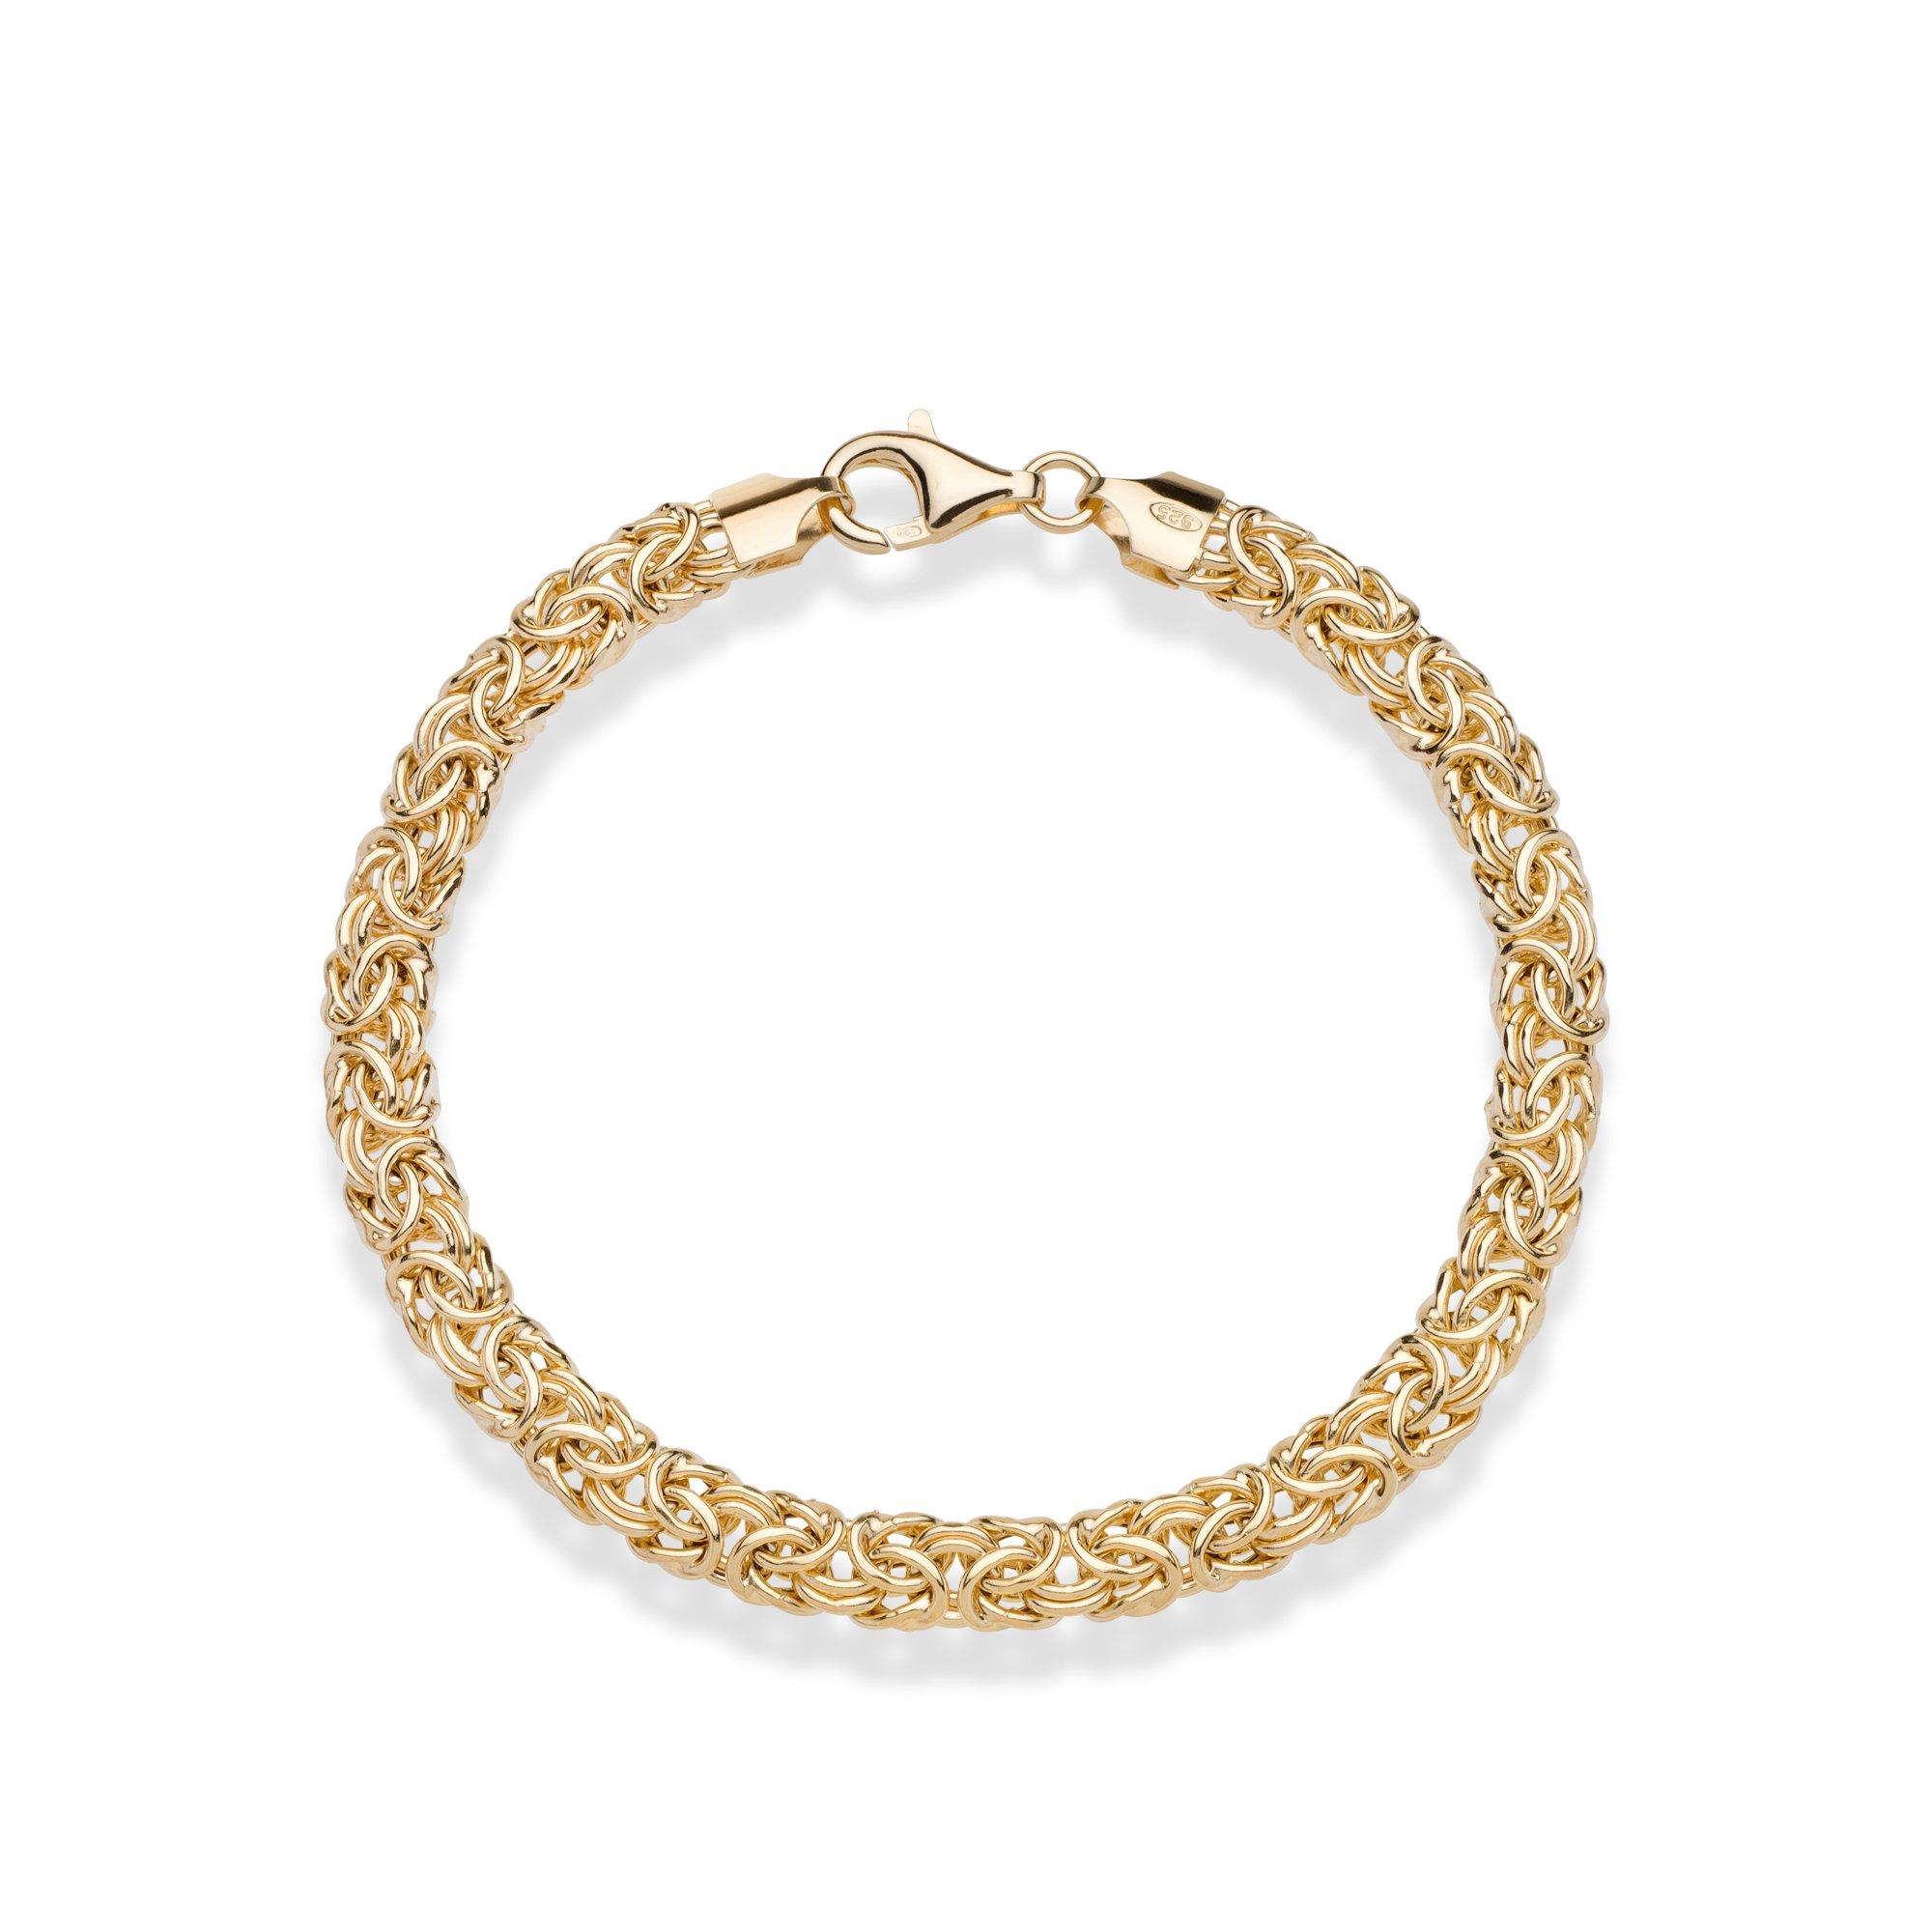 MiaBella 18K Gold Over Sterling Silver Italian Byzantine Bracelet, 7.25''-8'' (7.25)